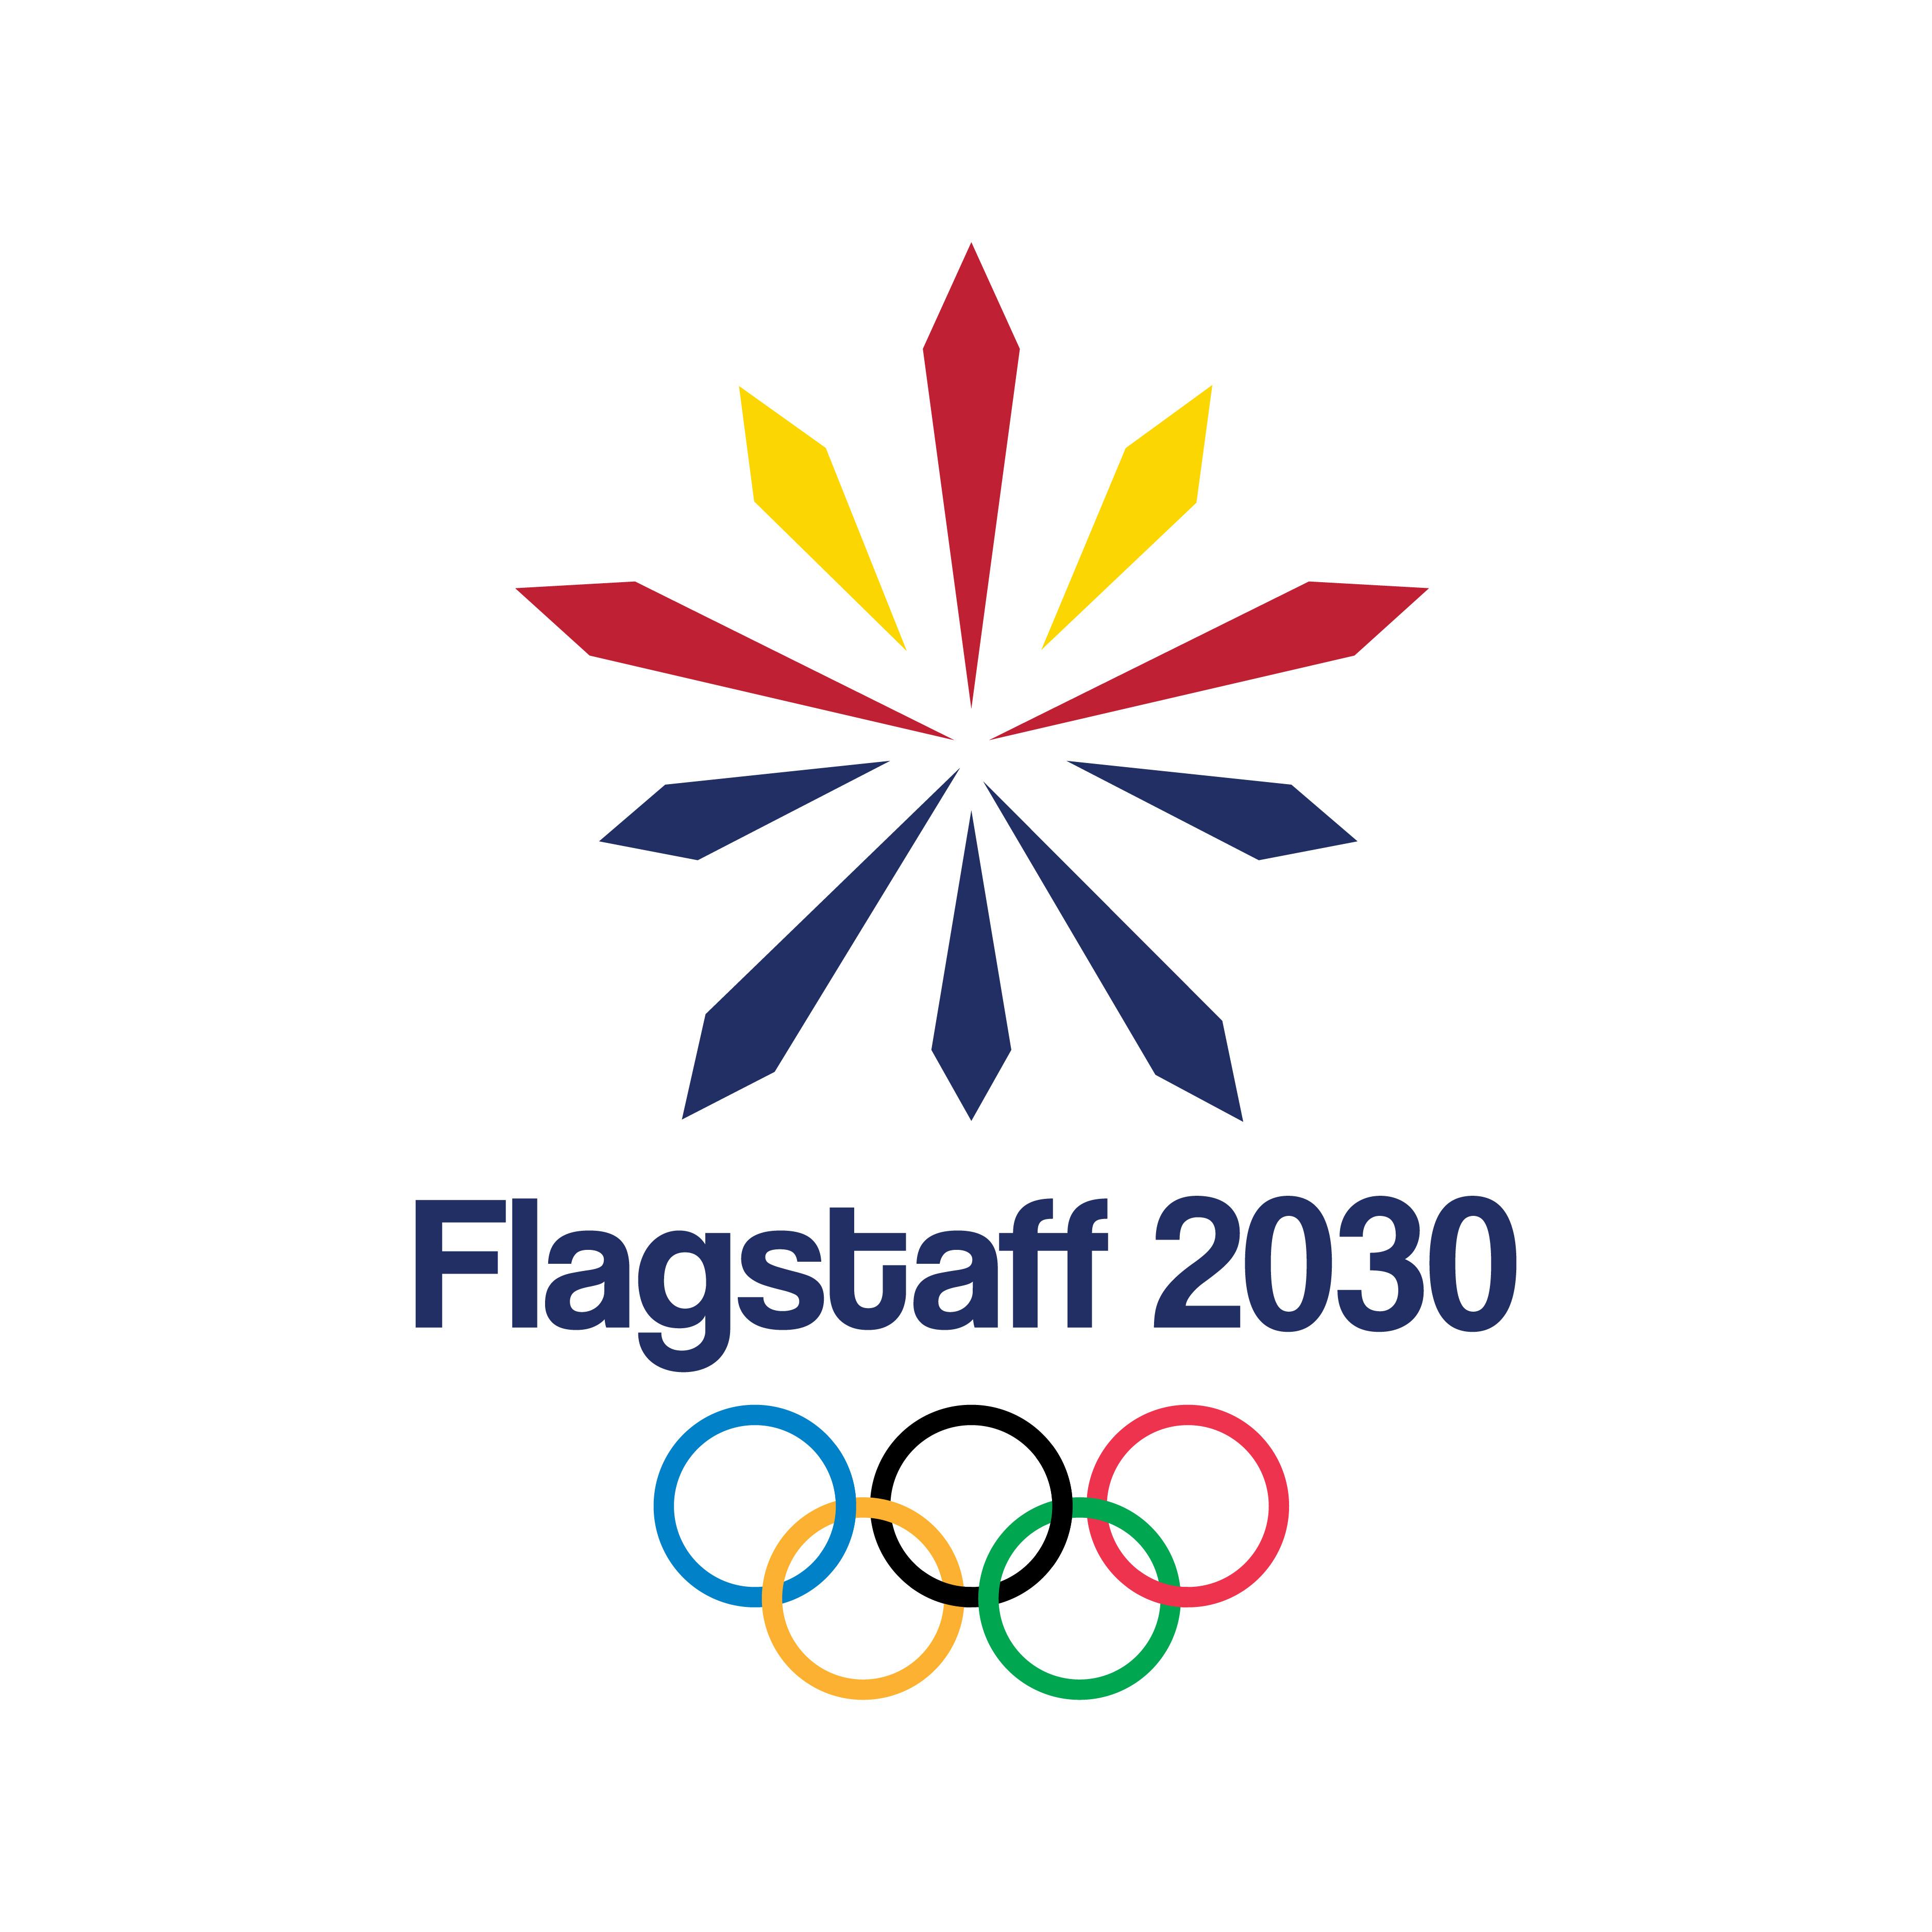 Flagstaff 2030 Olympics